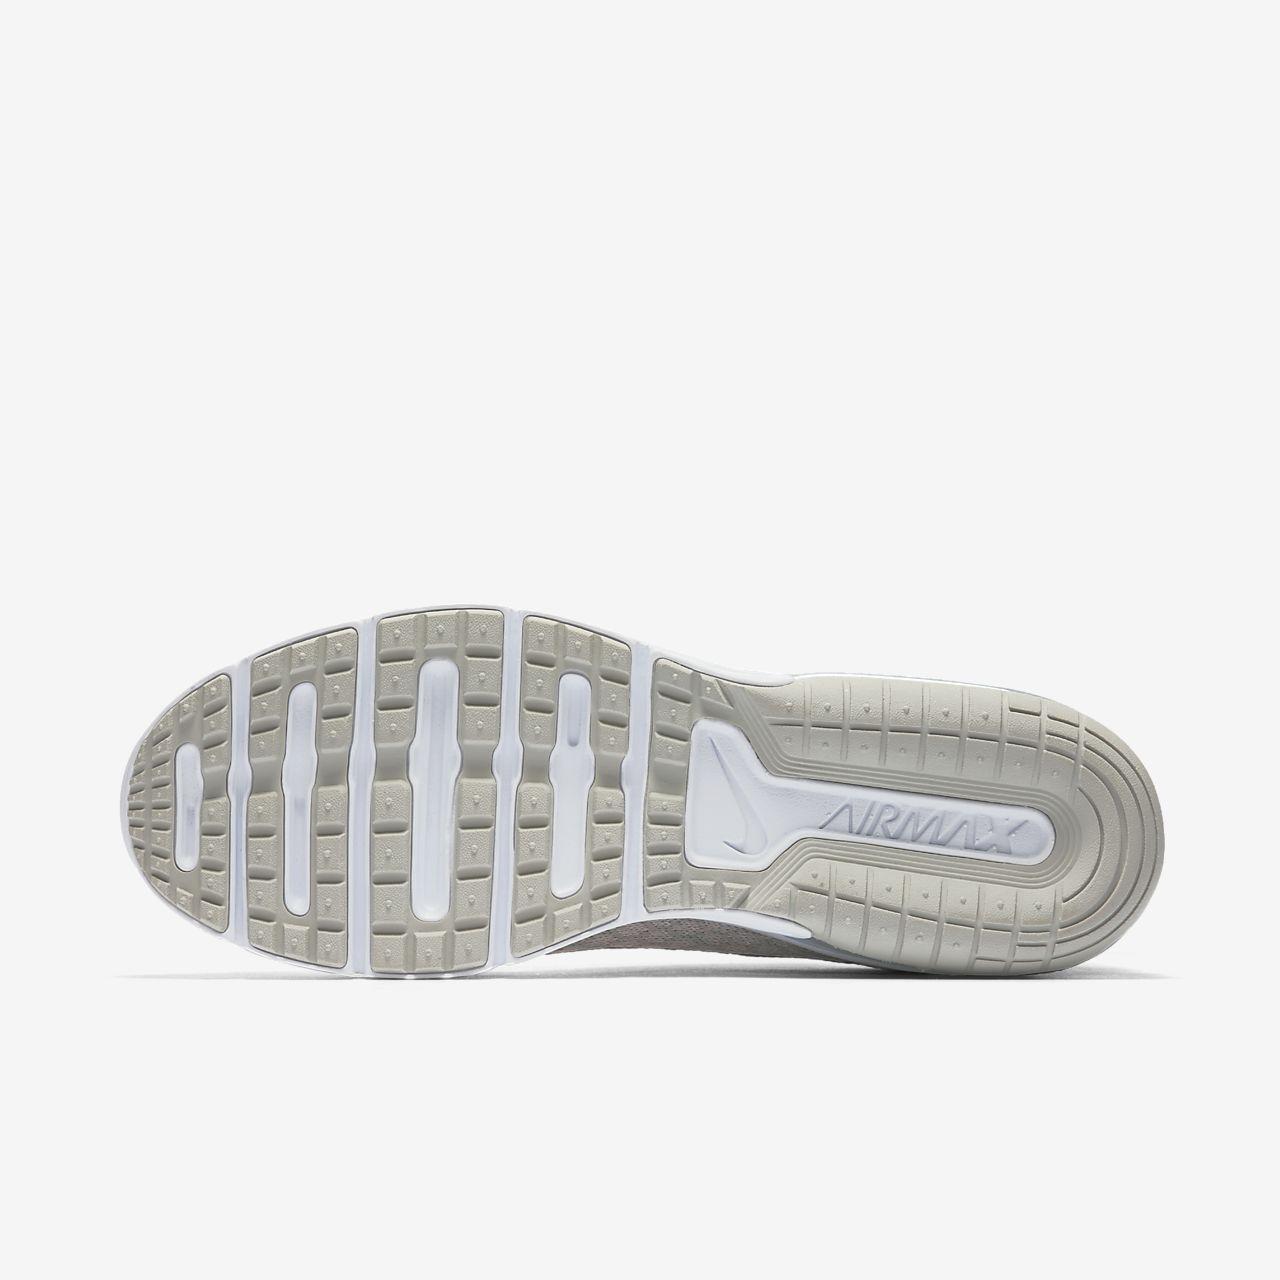 Grande sconto Nike Air Huarache Run SE Light Bone Nike Donna